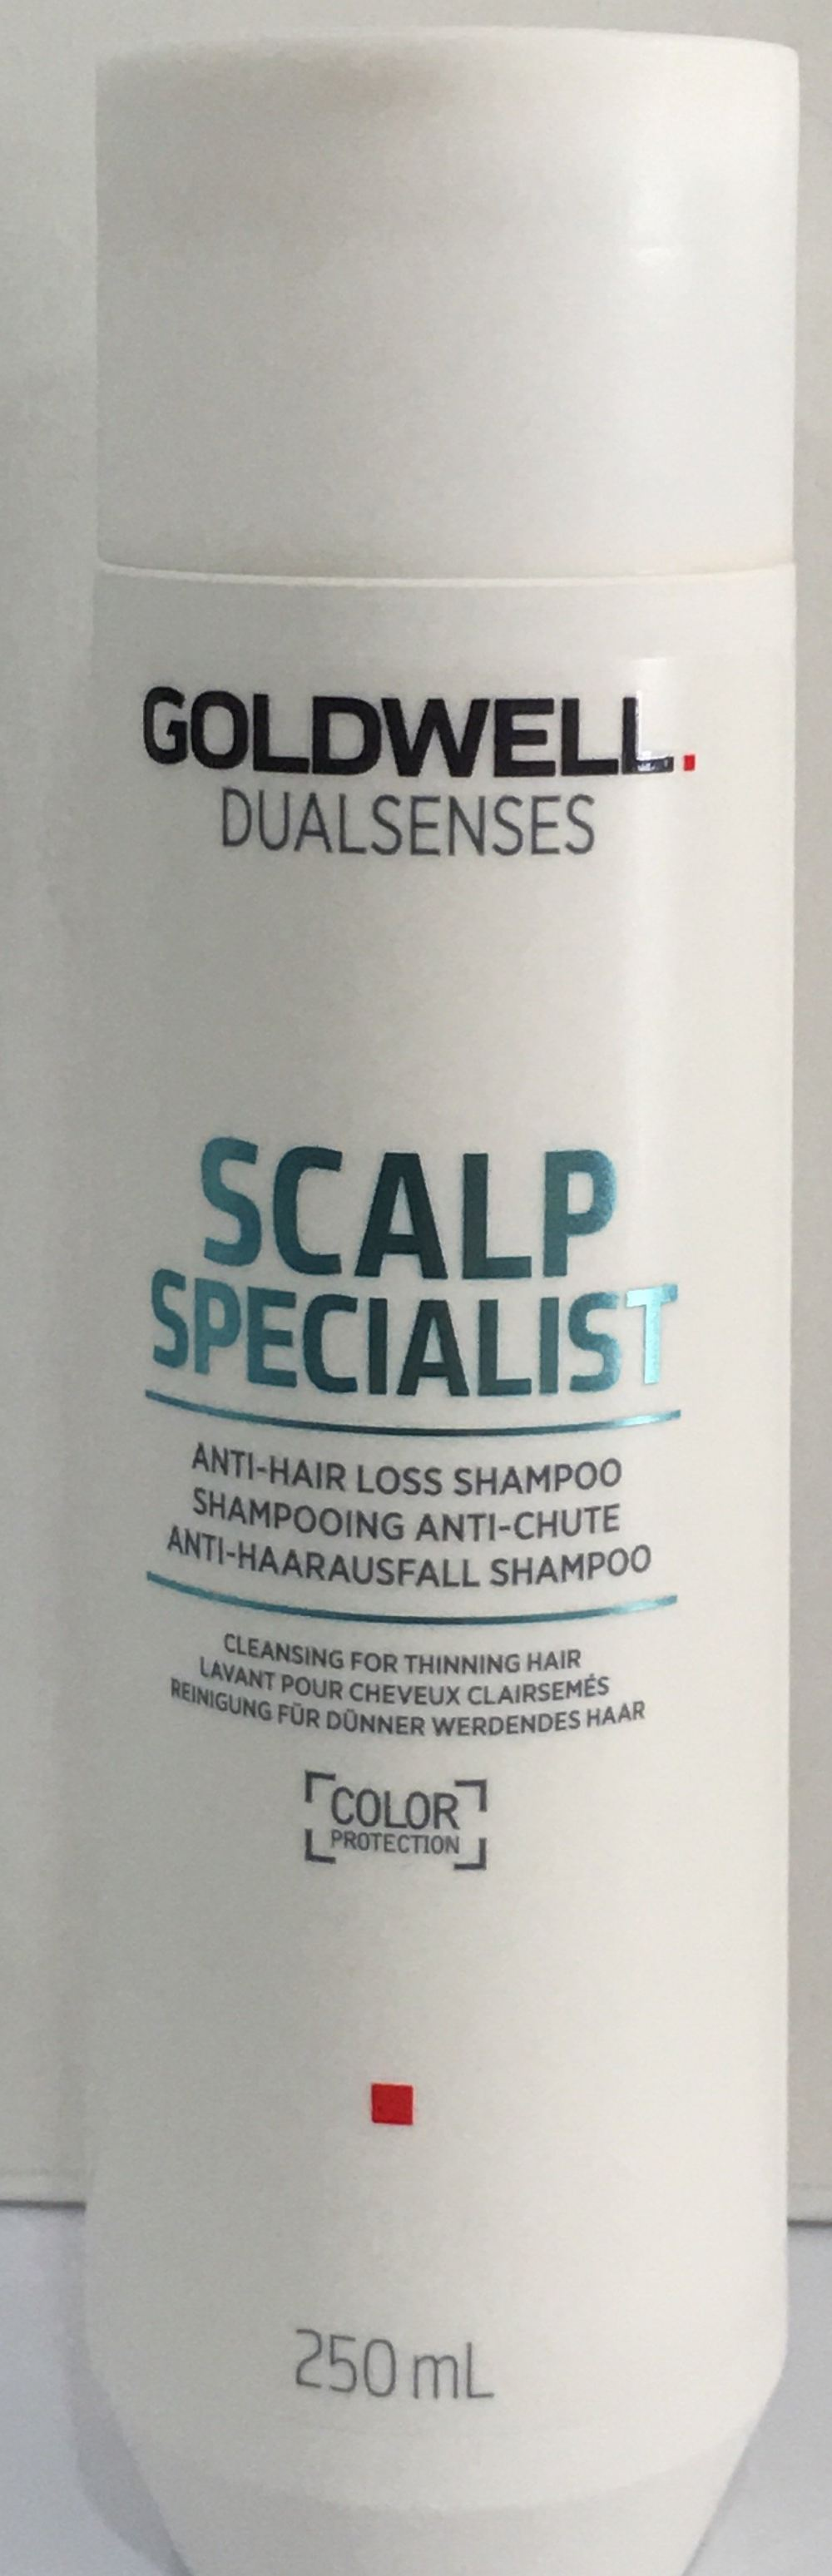 Goldwell Scalp Specialist Anti-Hairloss Shampoo (250ml)